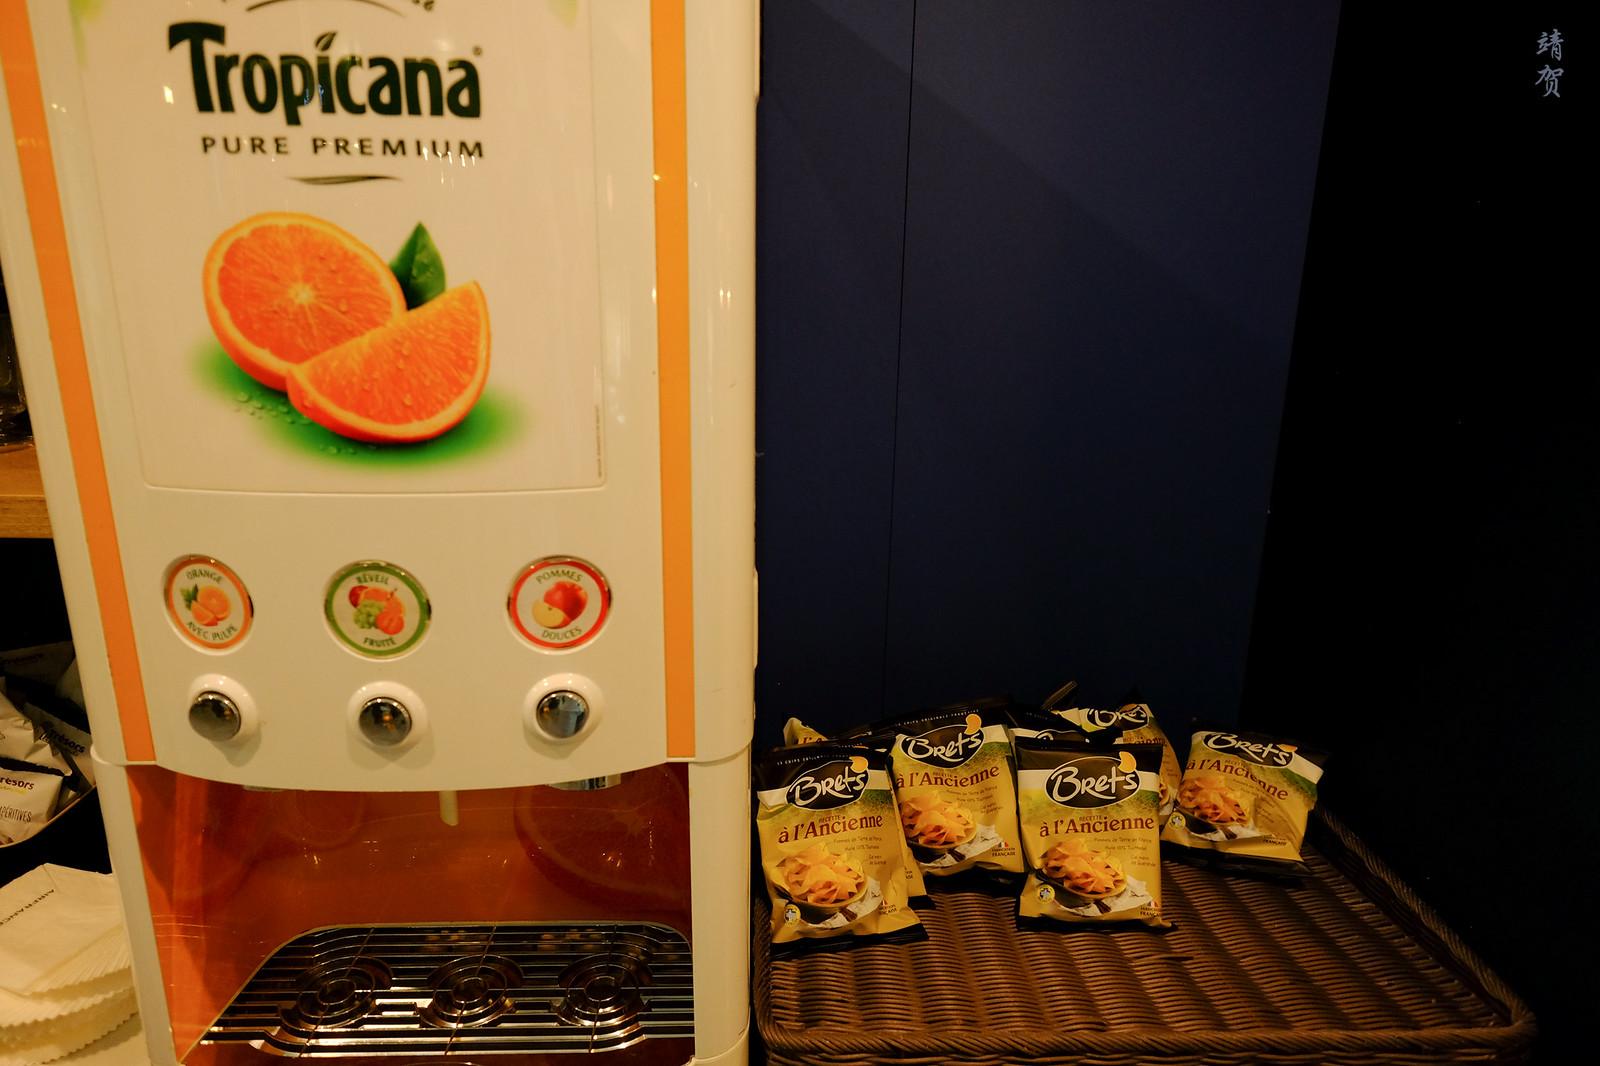 Tropicana juice dispenser